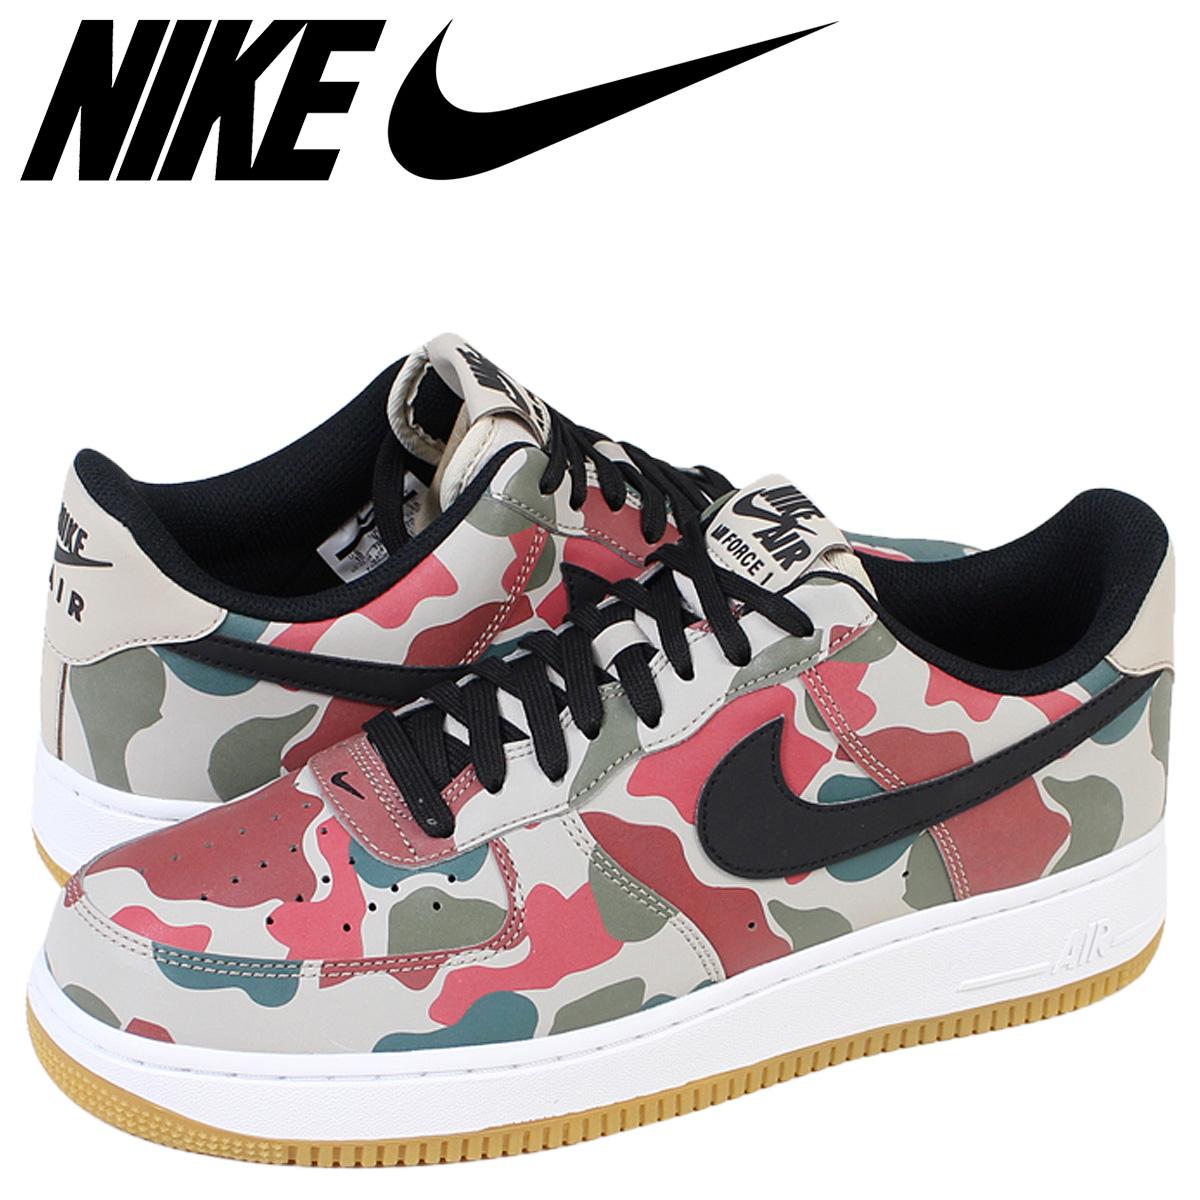 NIKE AIR FORCE 1 07 LV8 air force Nike sneakers air force 718,152 201 camouflage men